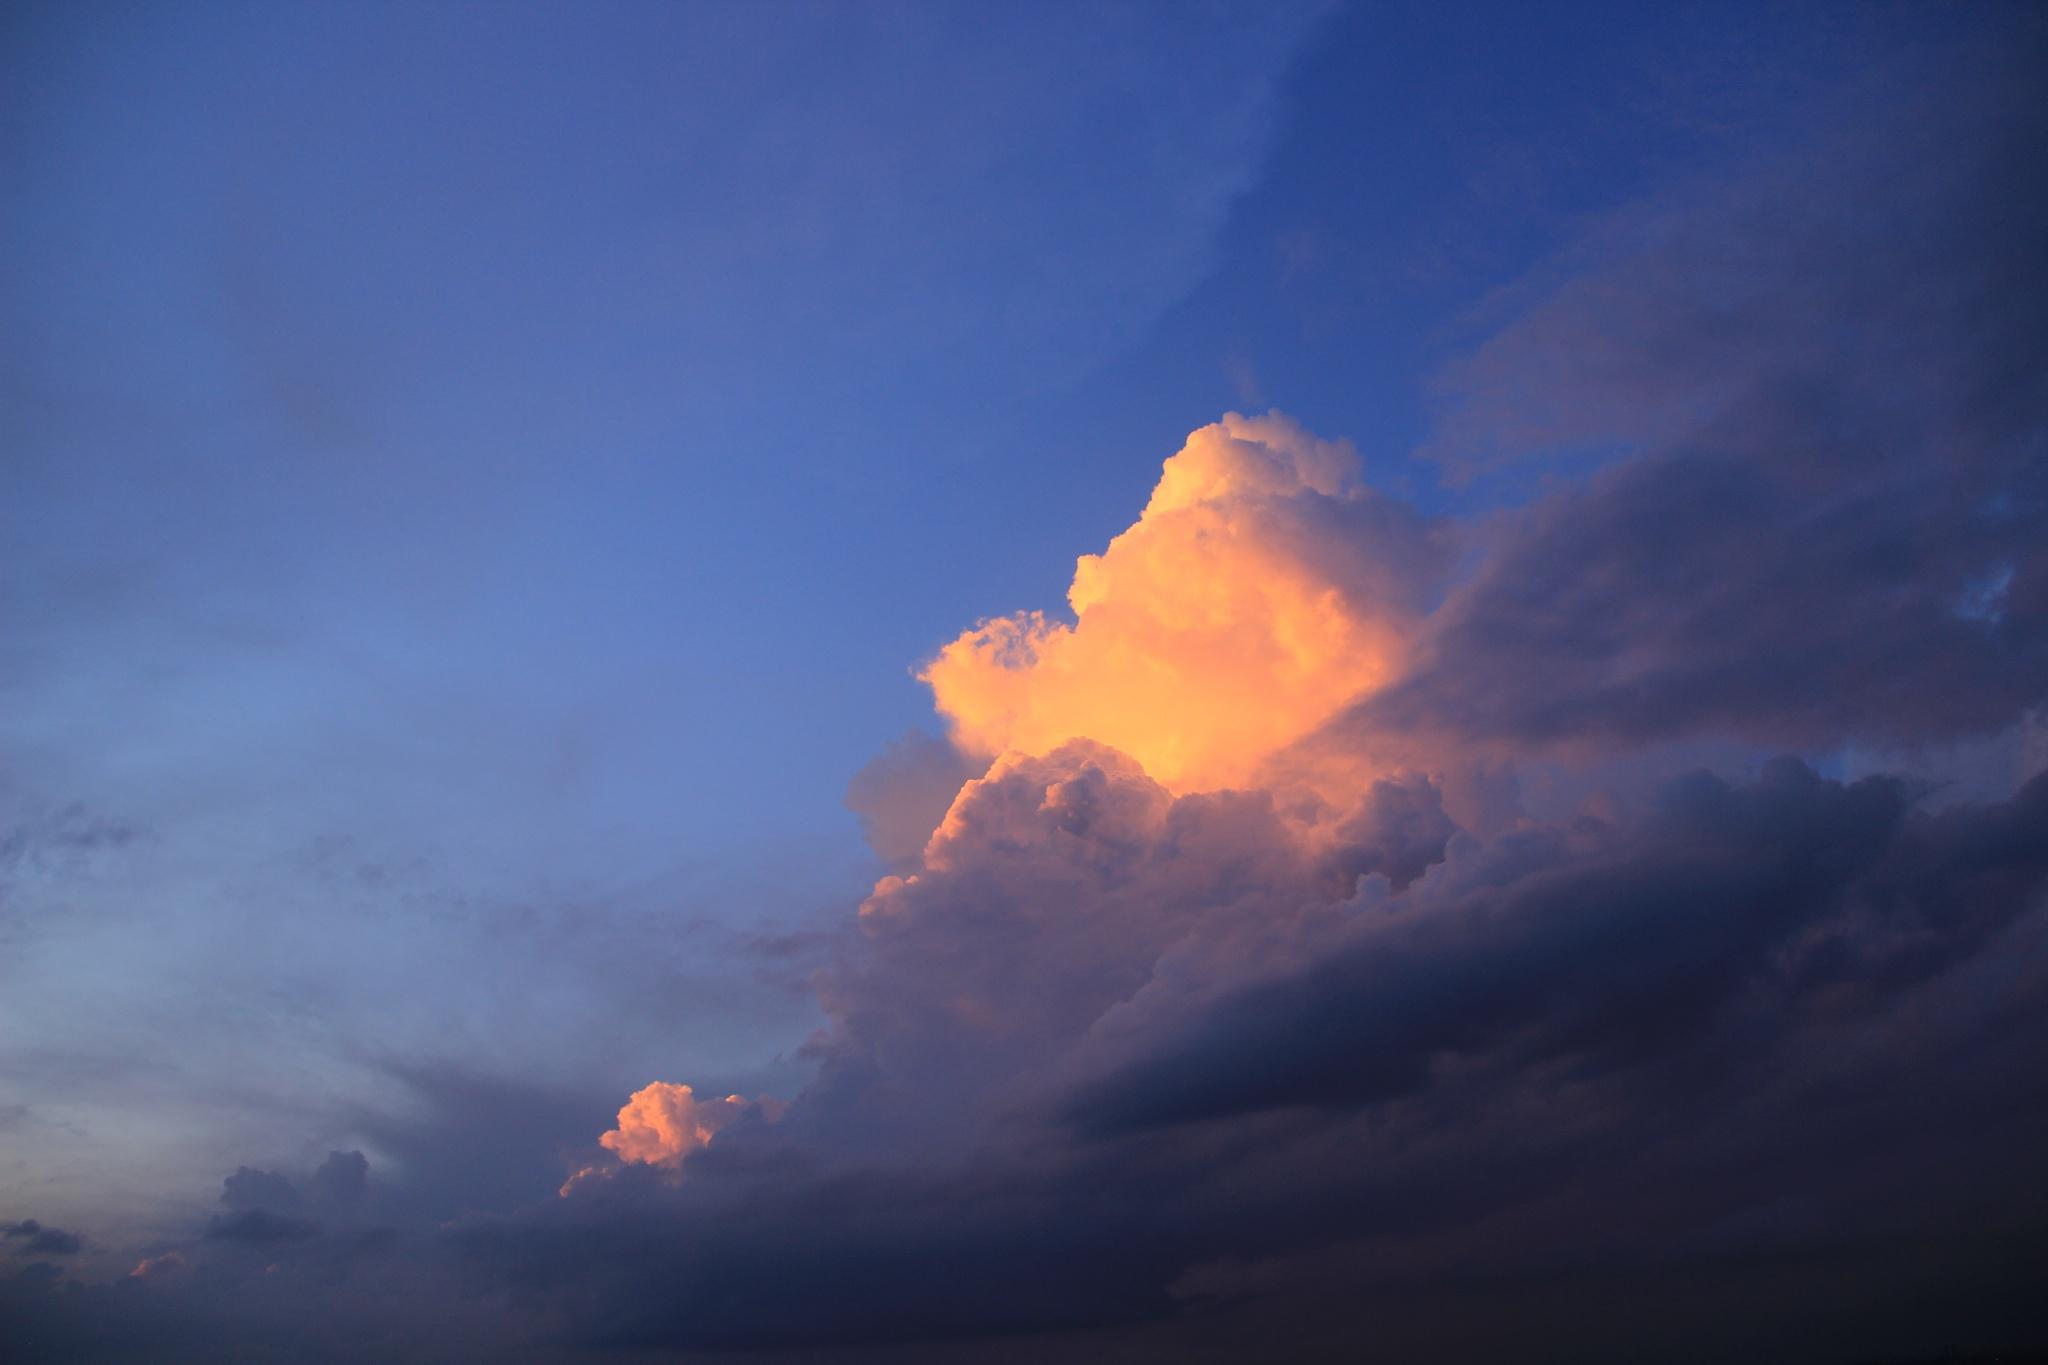 Gold in the sky. by Irineu Lúcio